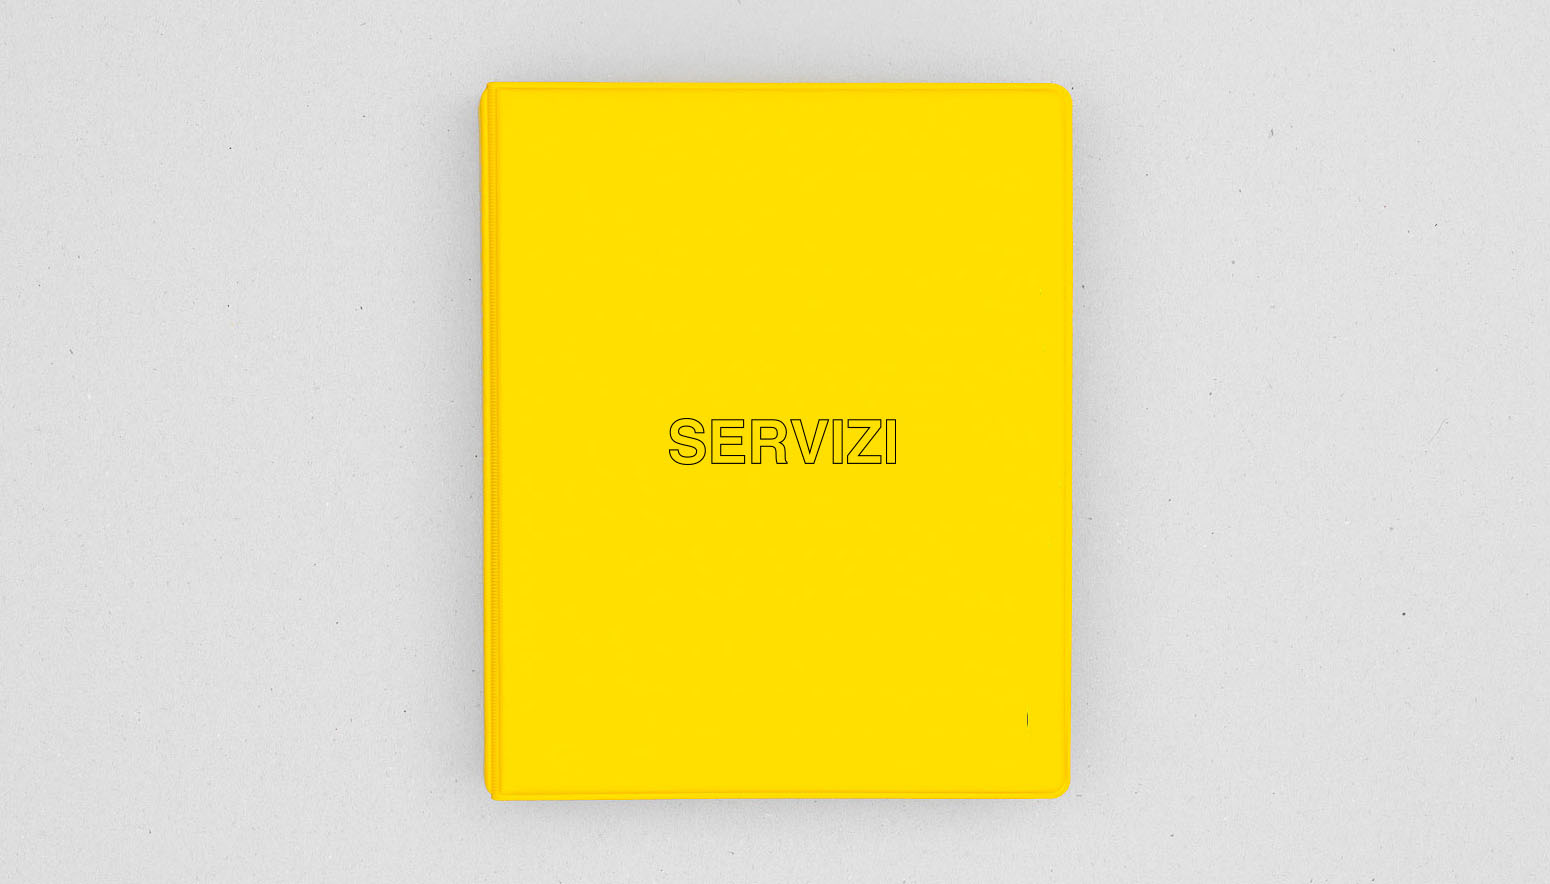 servizi copywriter